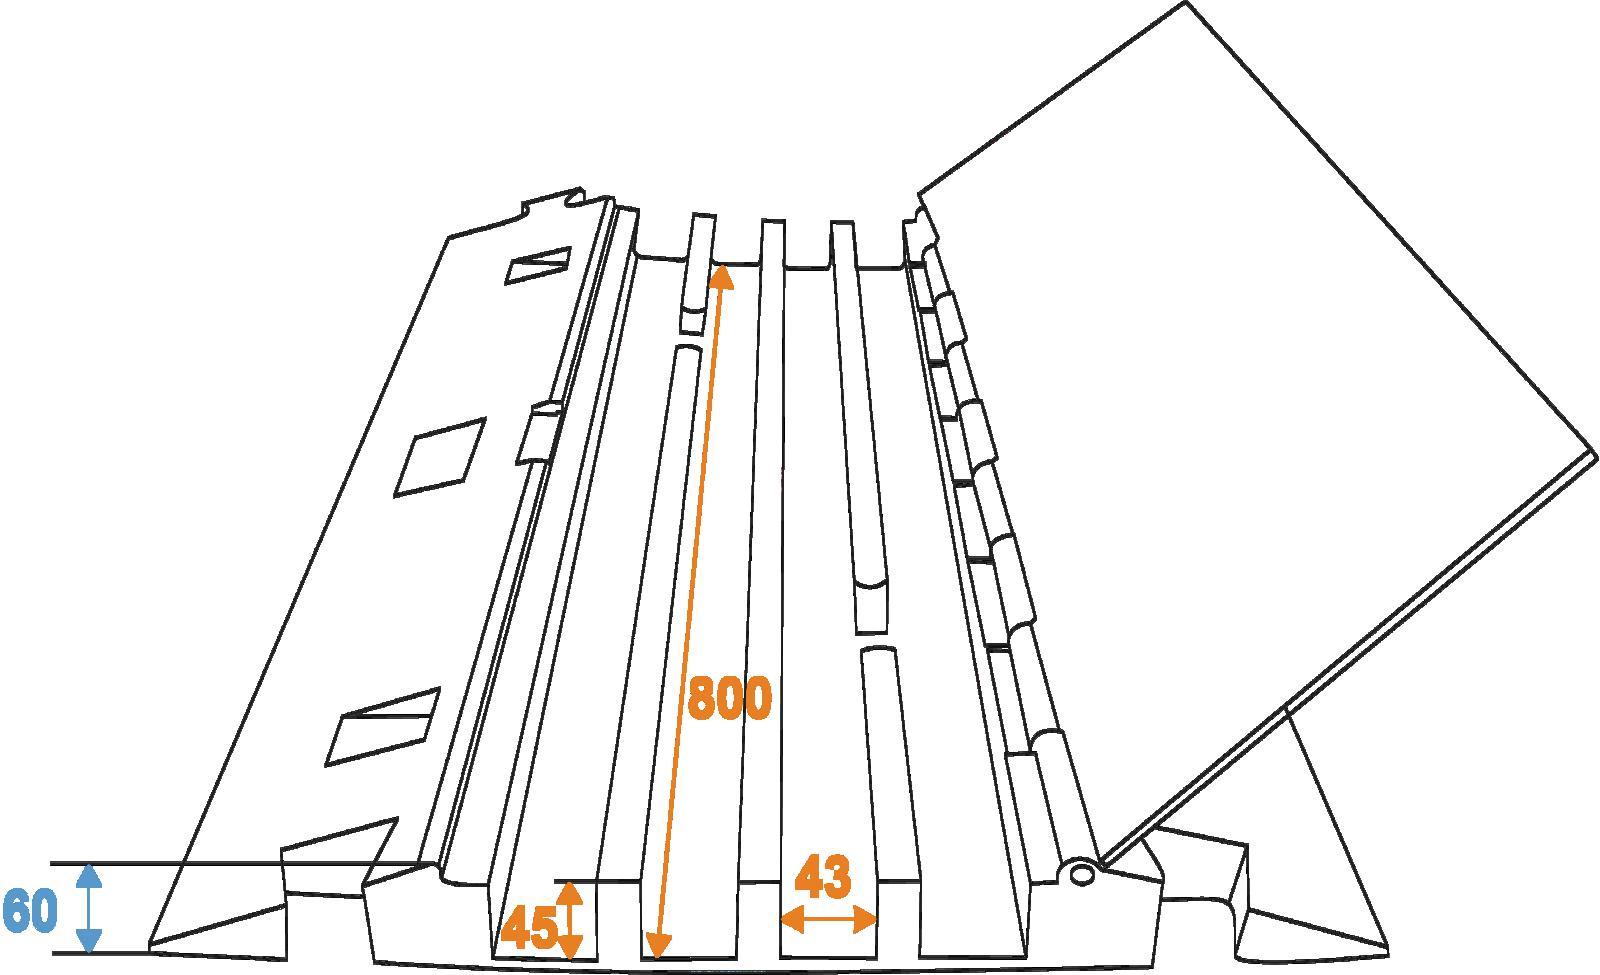 EUROLITE Cablebridge 4 canali 800 mm x 550mm